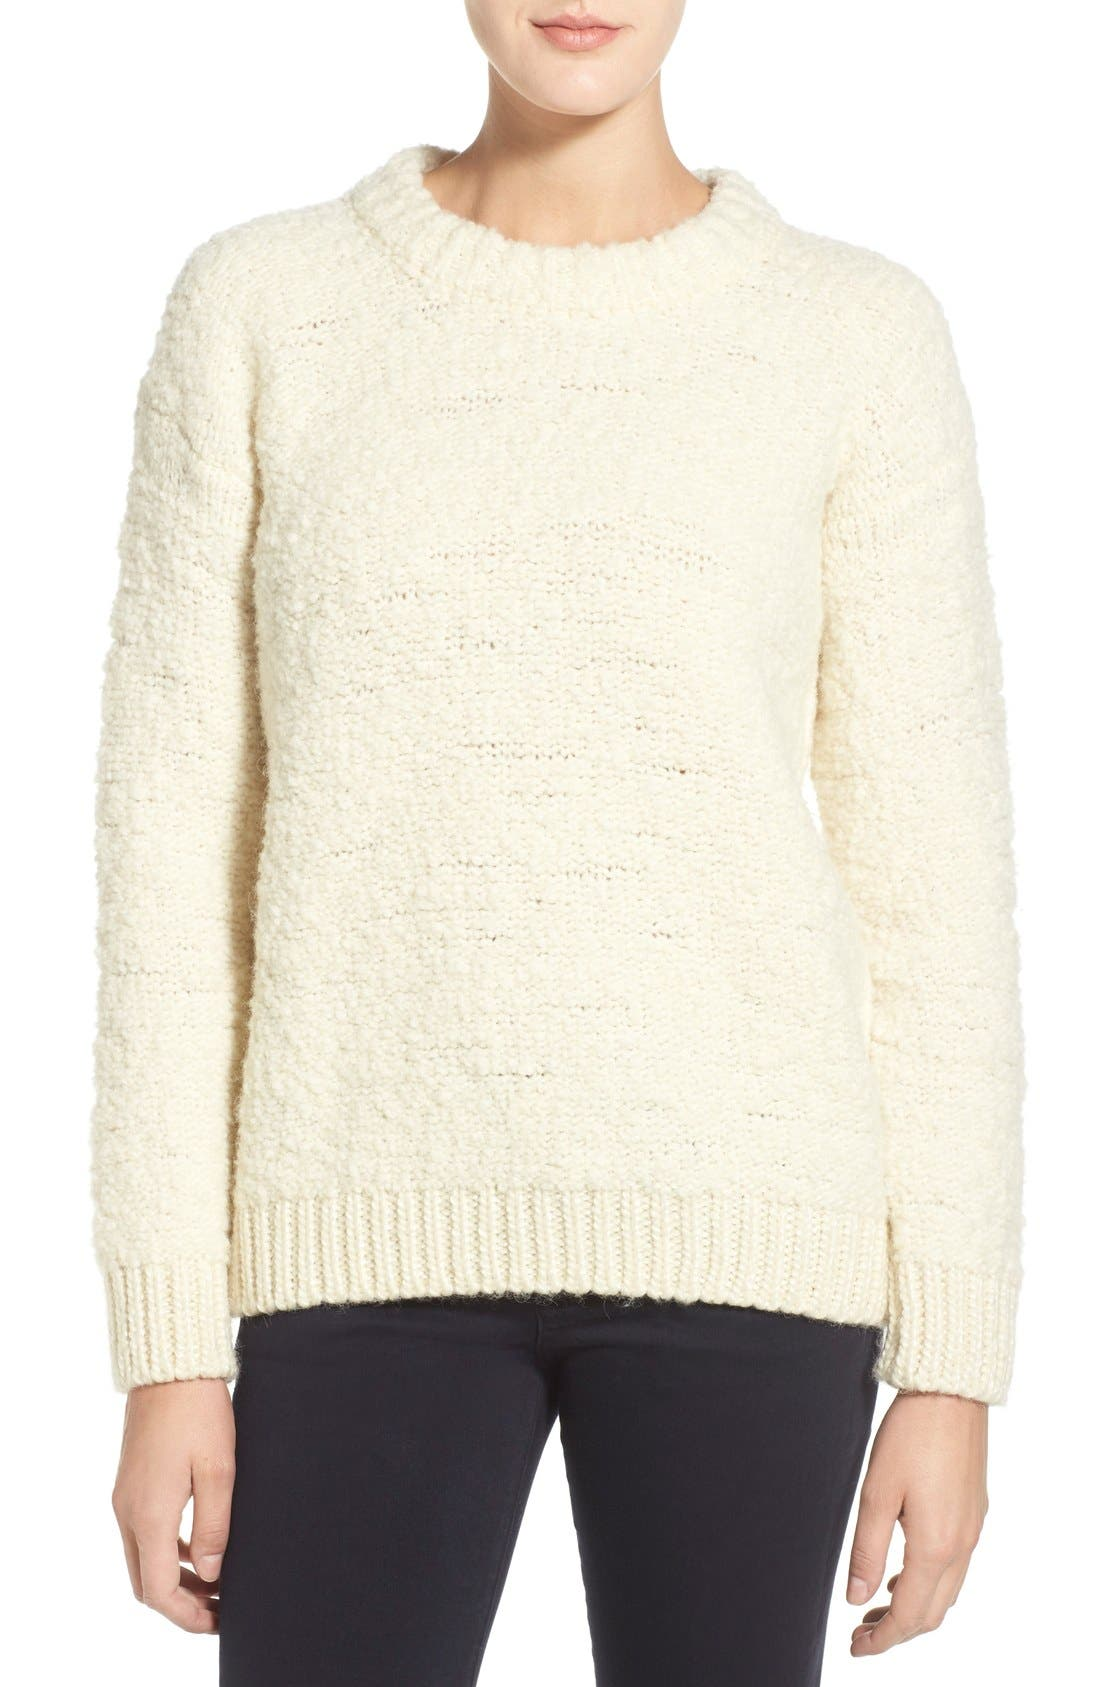 Alternate Image 1 Selected - M.i.h. Jeans 'Bird' Bouclé Crewneck Sweater